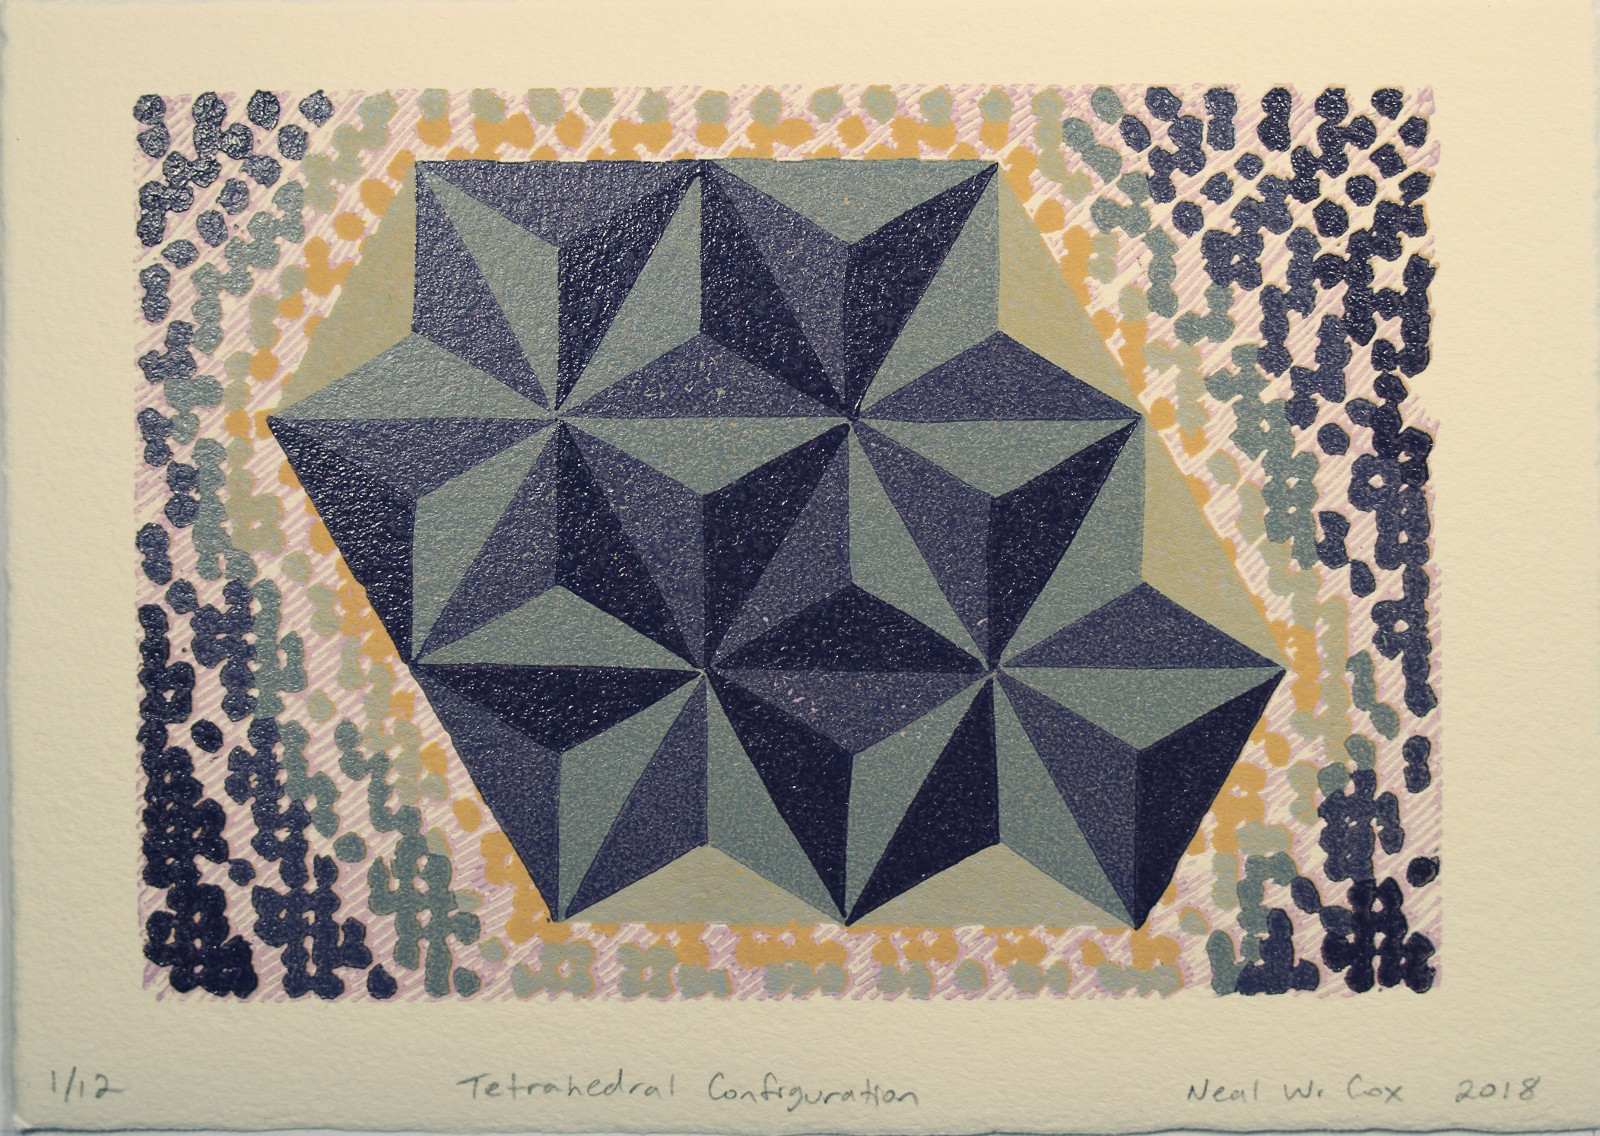 Tetrahedral Configuration